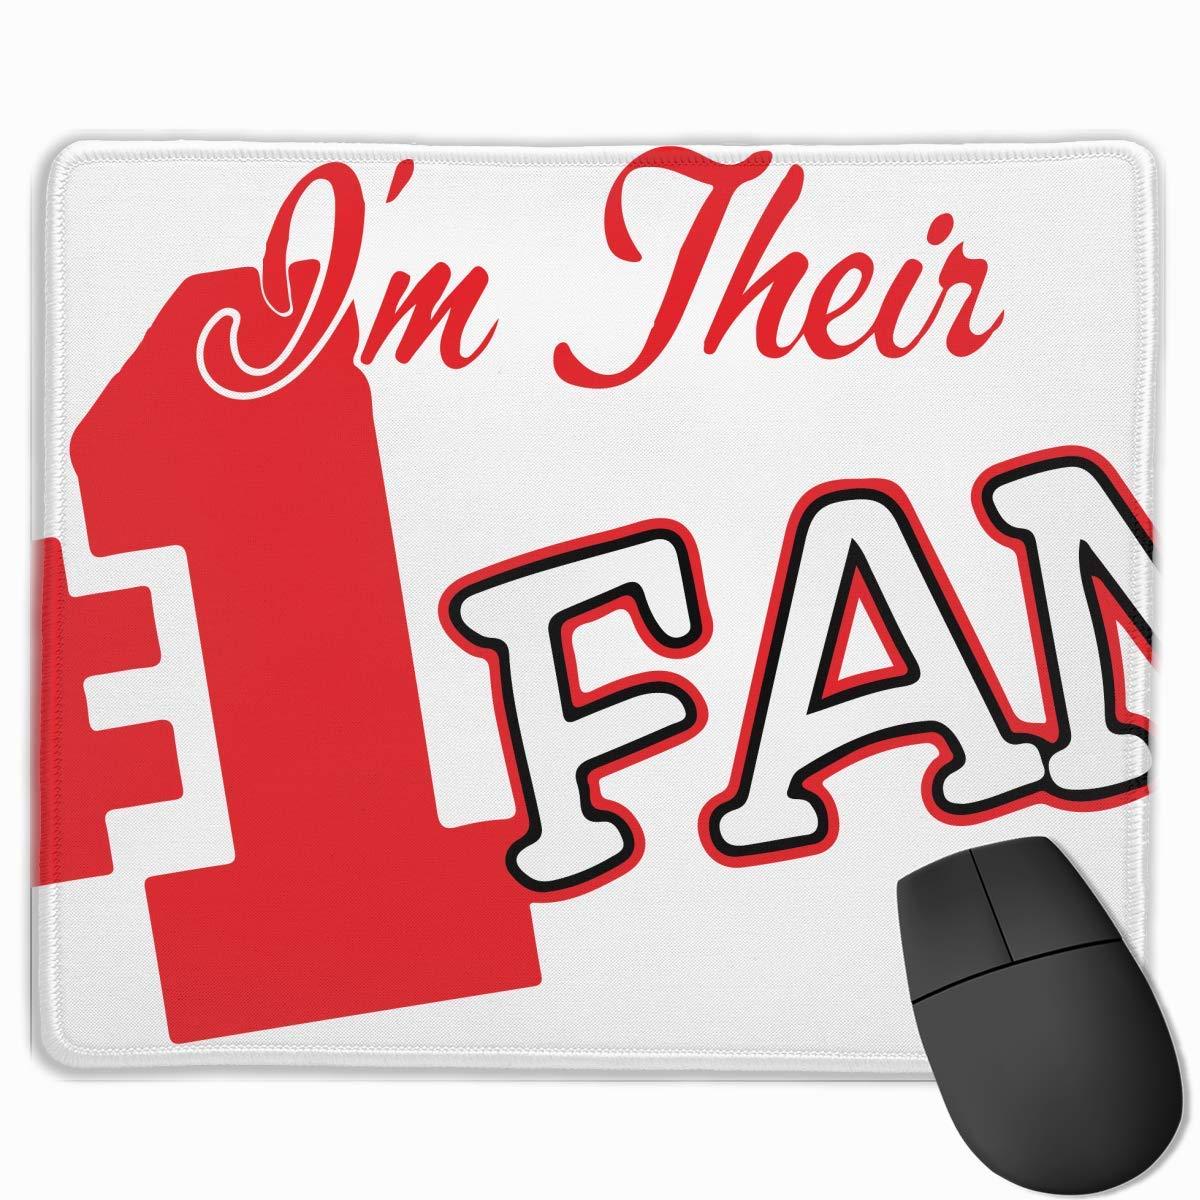 Soy Theis Number One Fan Béisbol Baloncesto Deportes Calidad Base ...